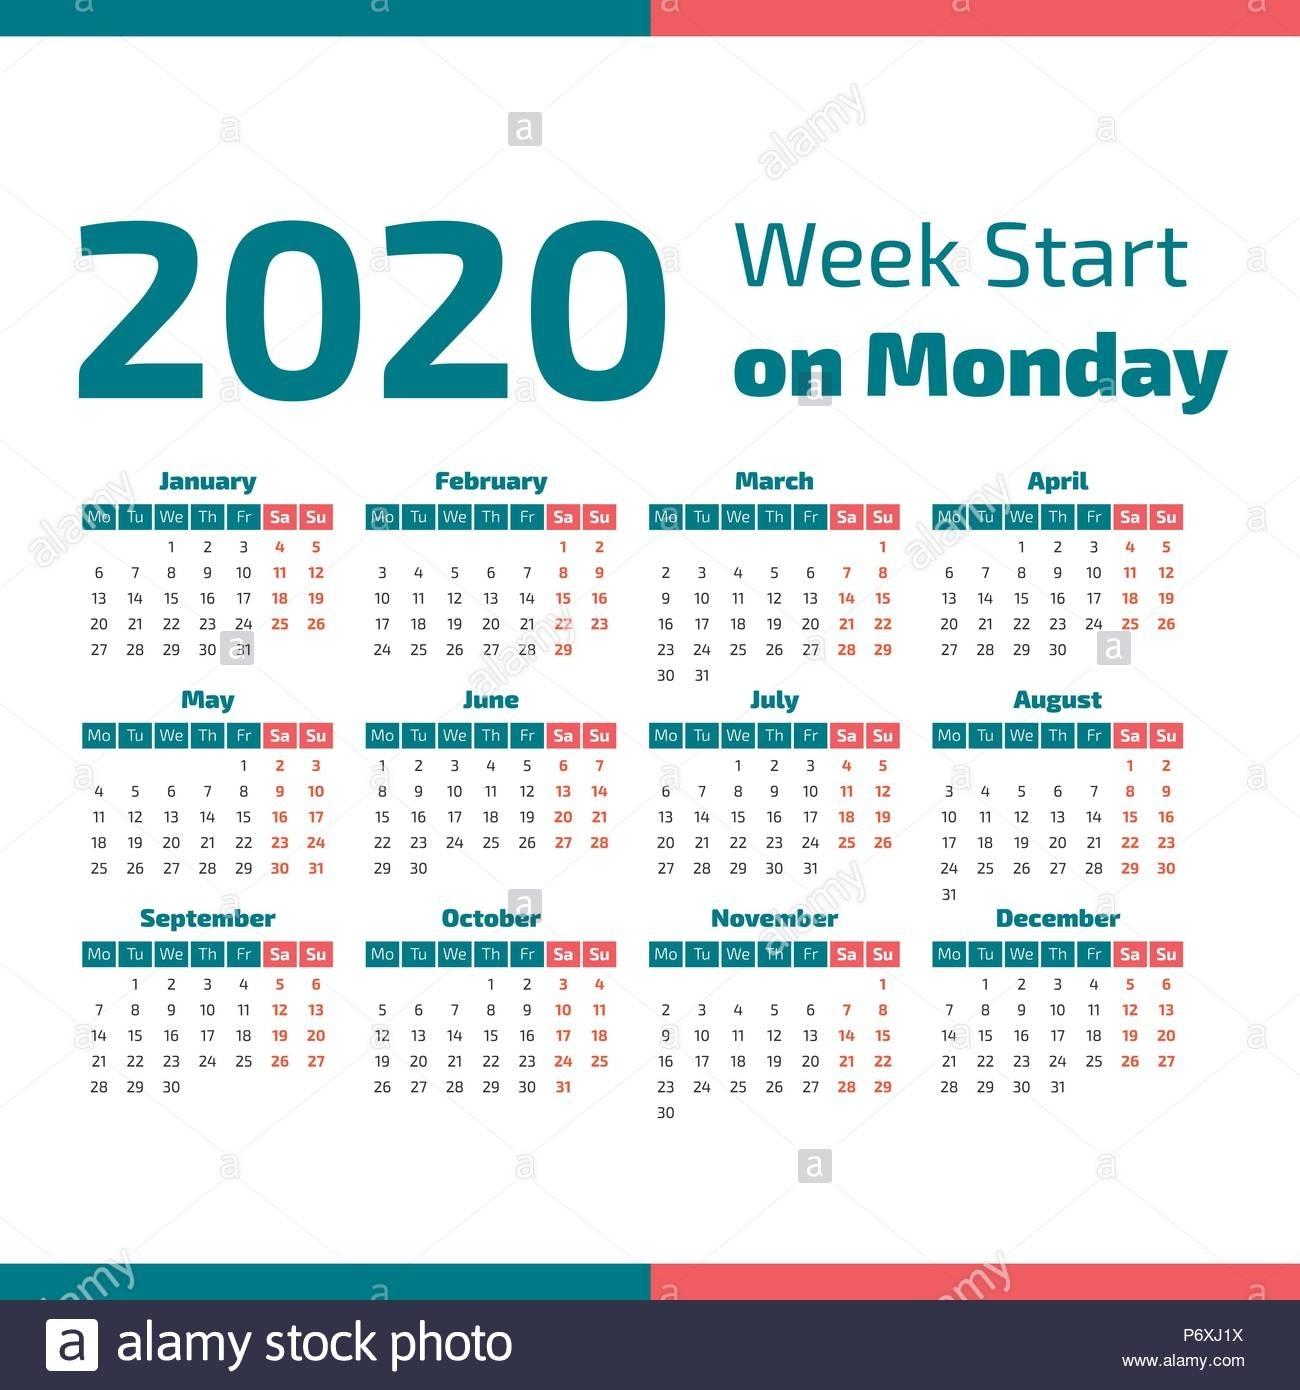 Perky 2020 Calendar Starting On Monday • Printable Blank Calendar for 2020 Calendar Starting With Monday